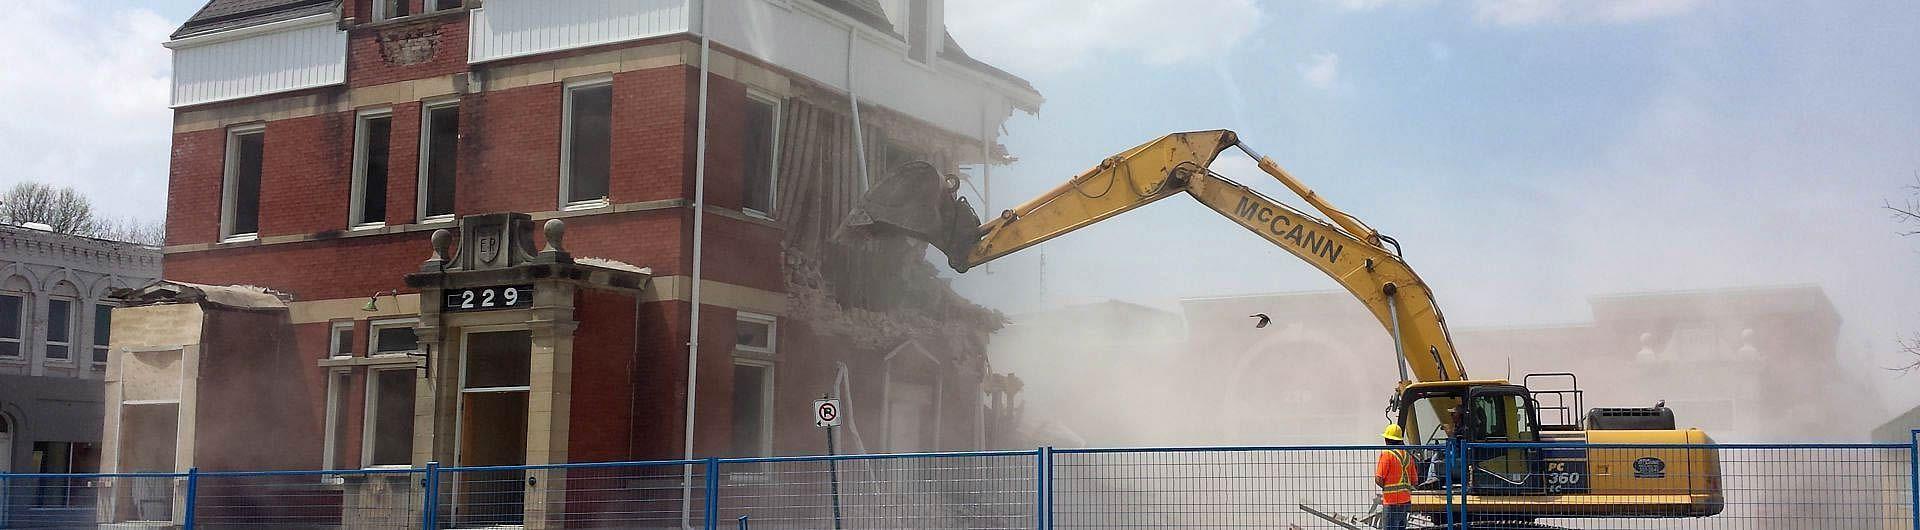 Municipal Building Demolition